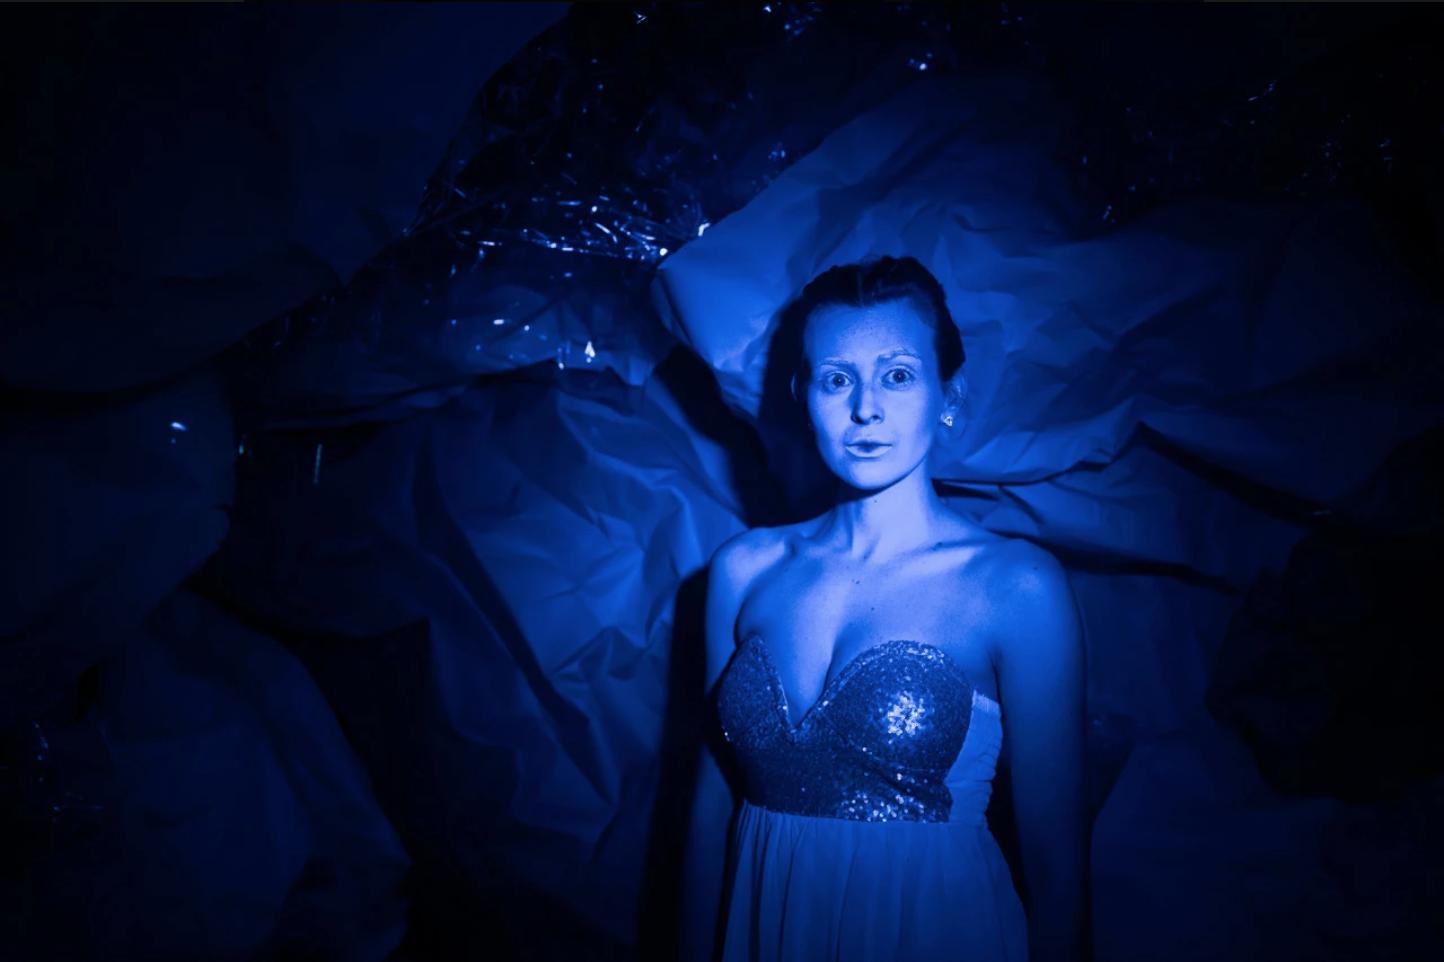 Portrait of female blue fairy